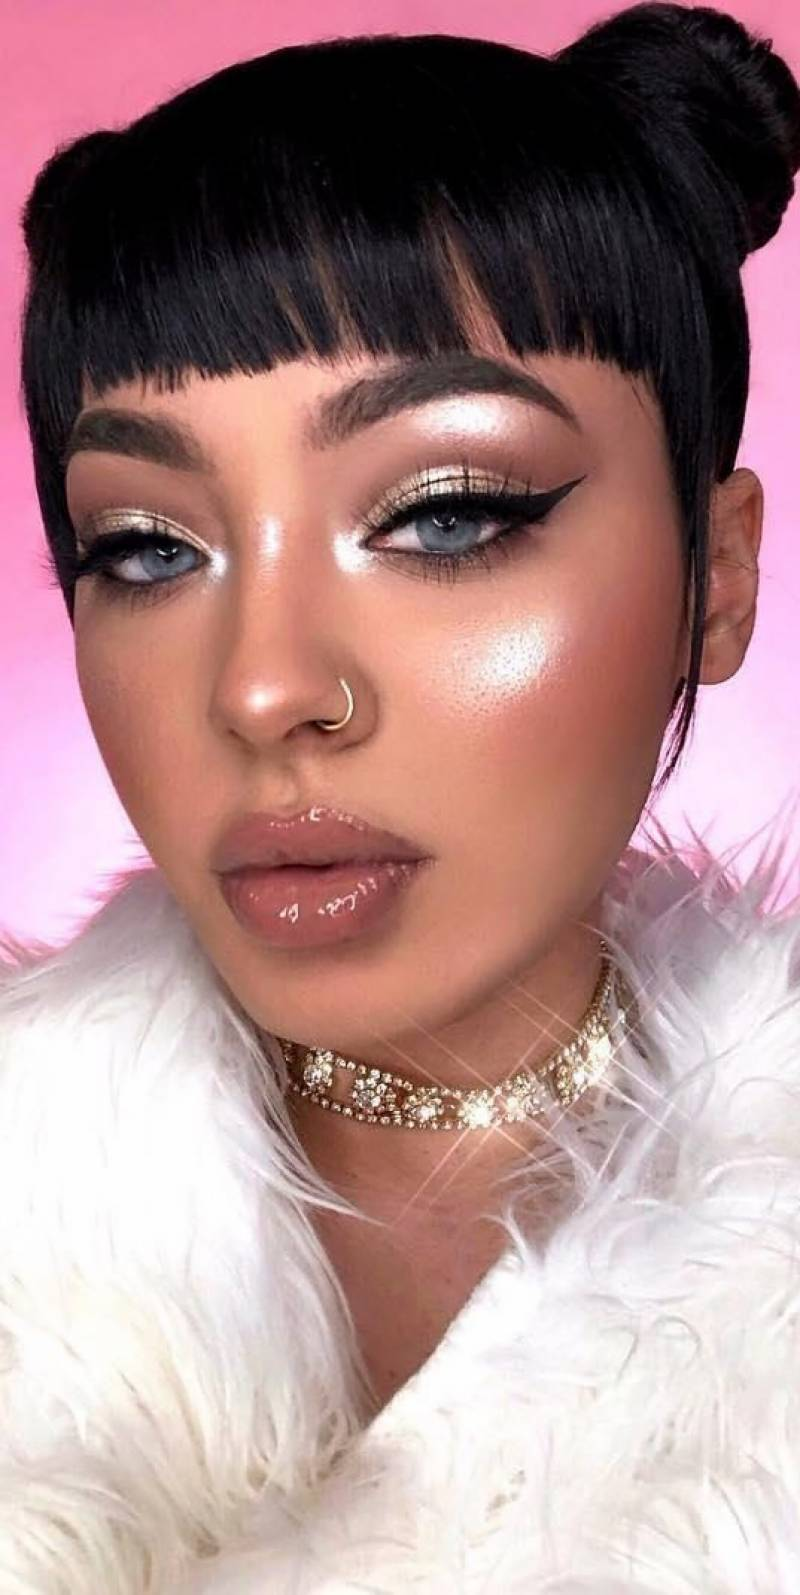 Bratz challenge make-up is taking over social media